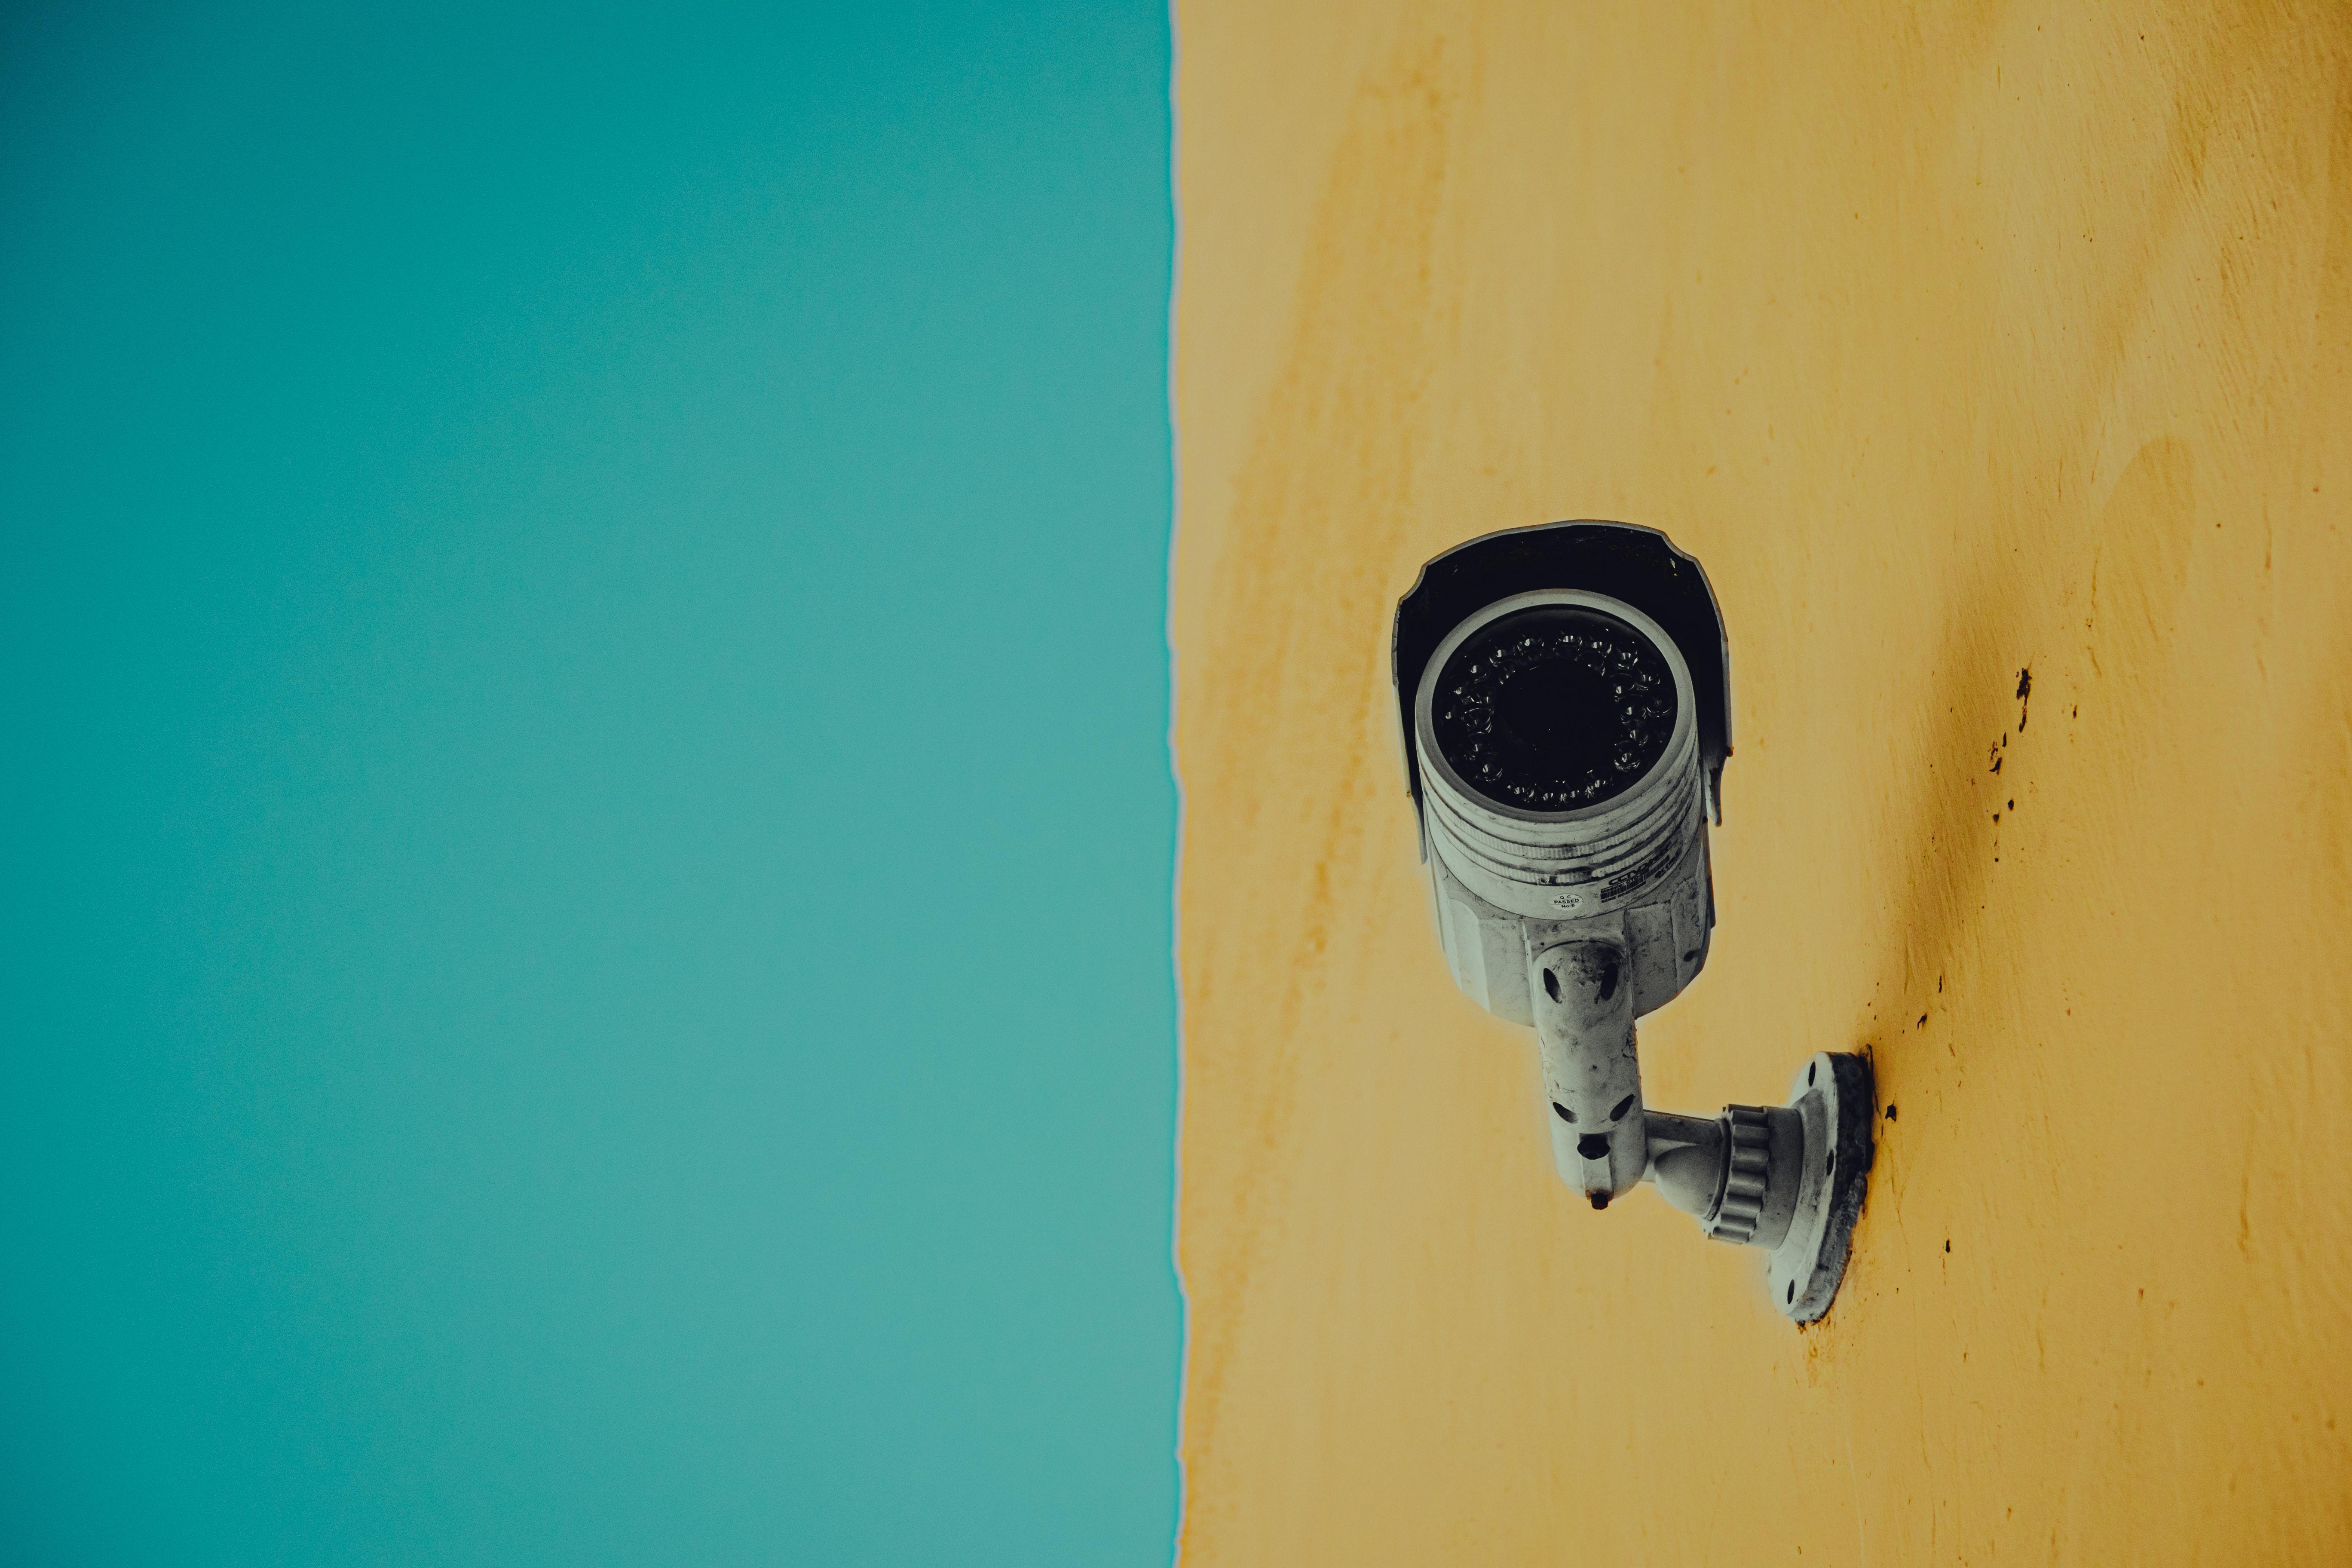 bullet-security camera